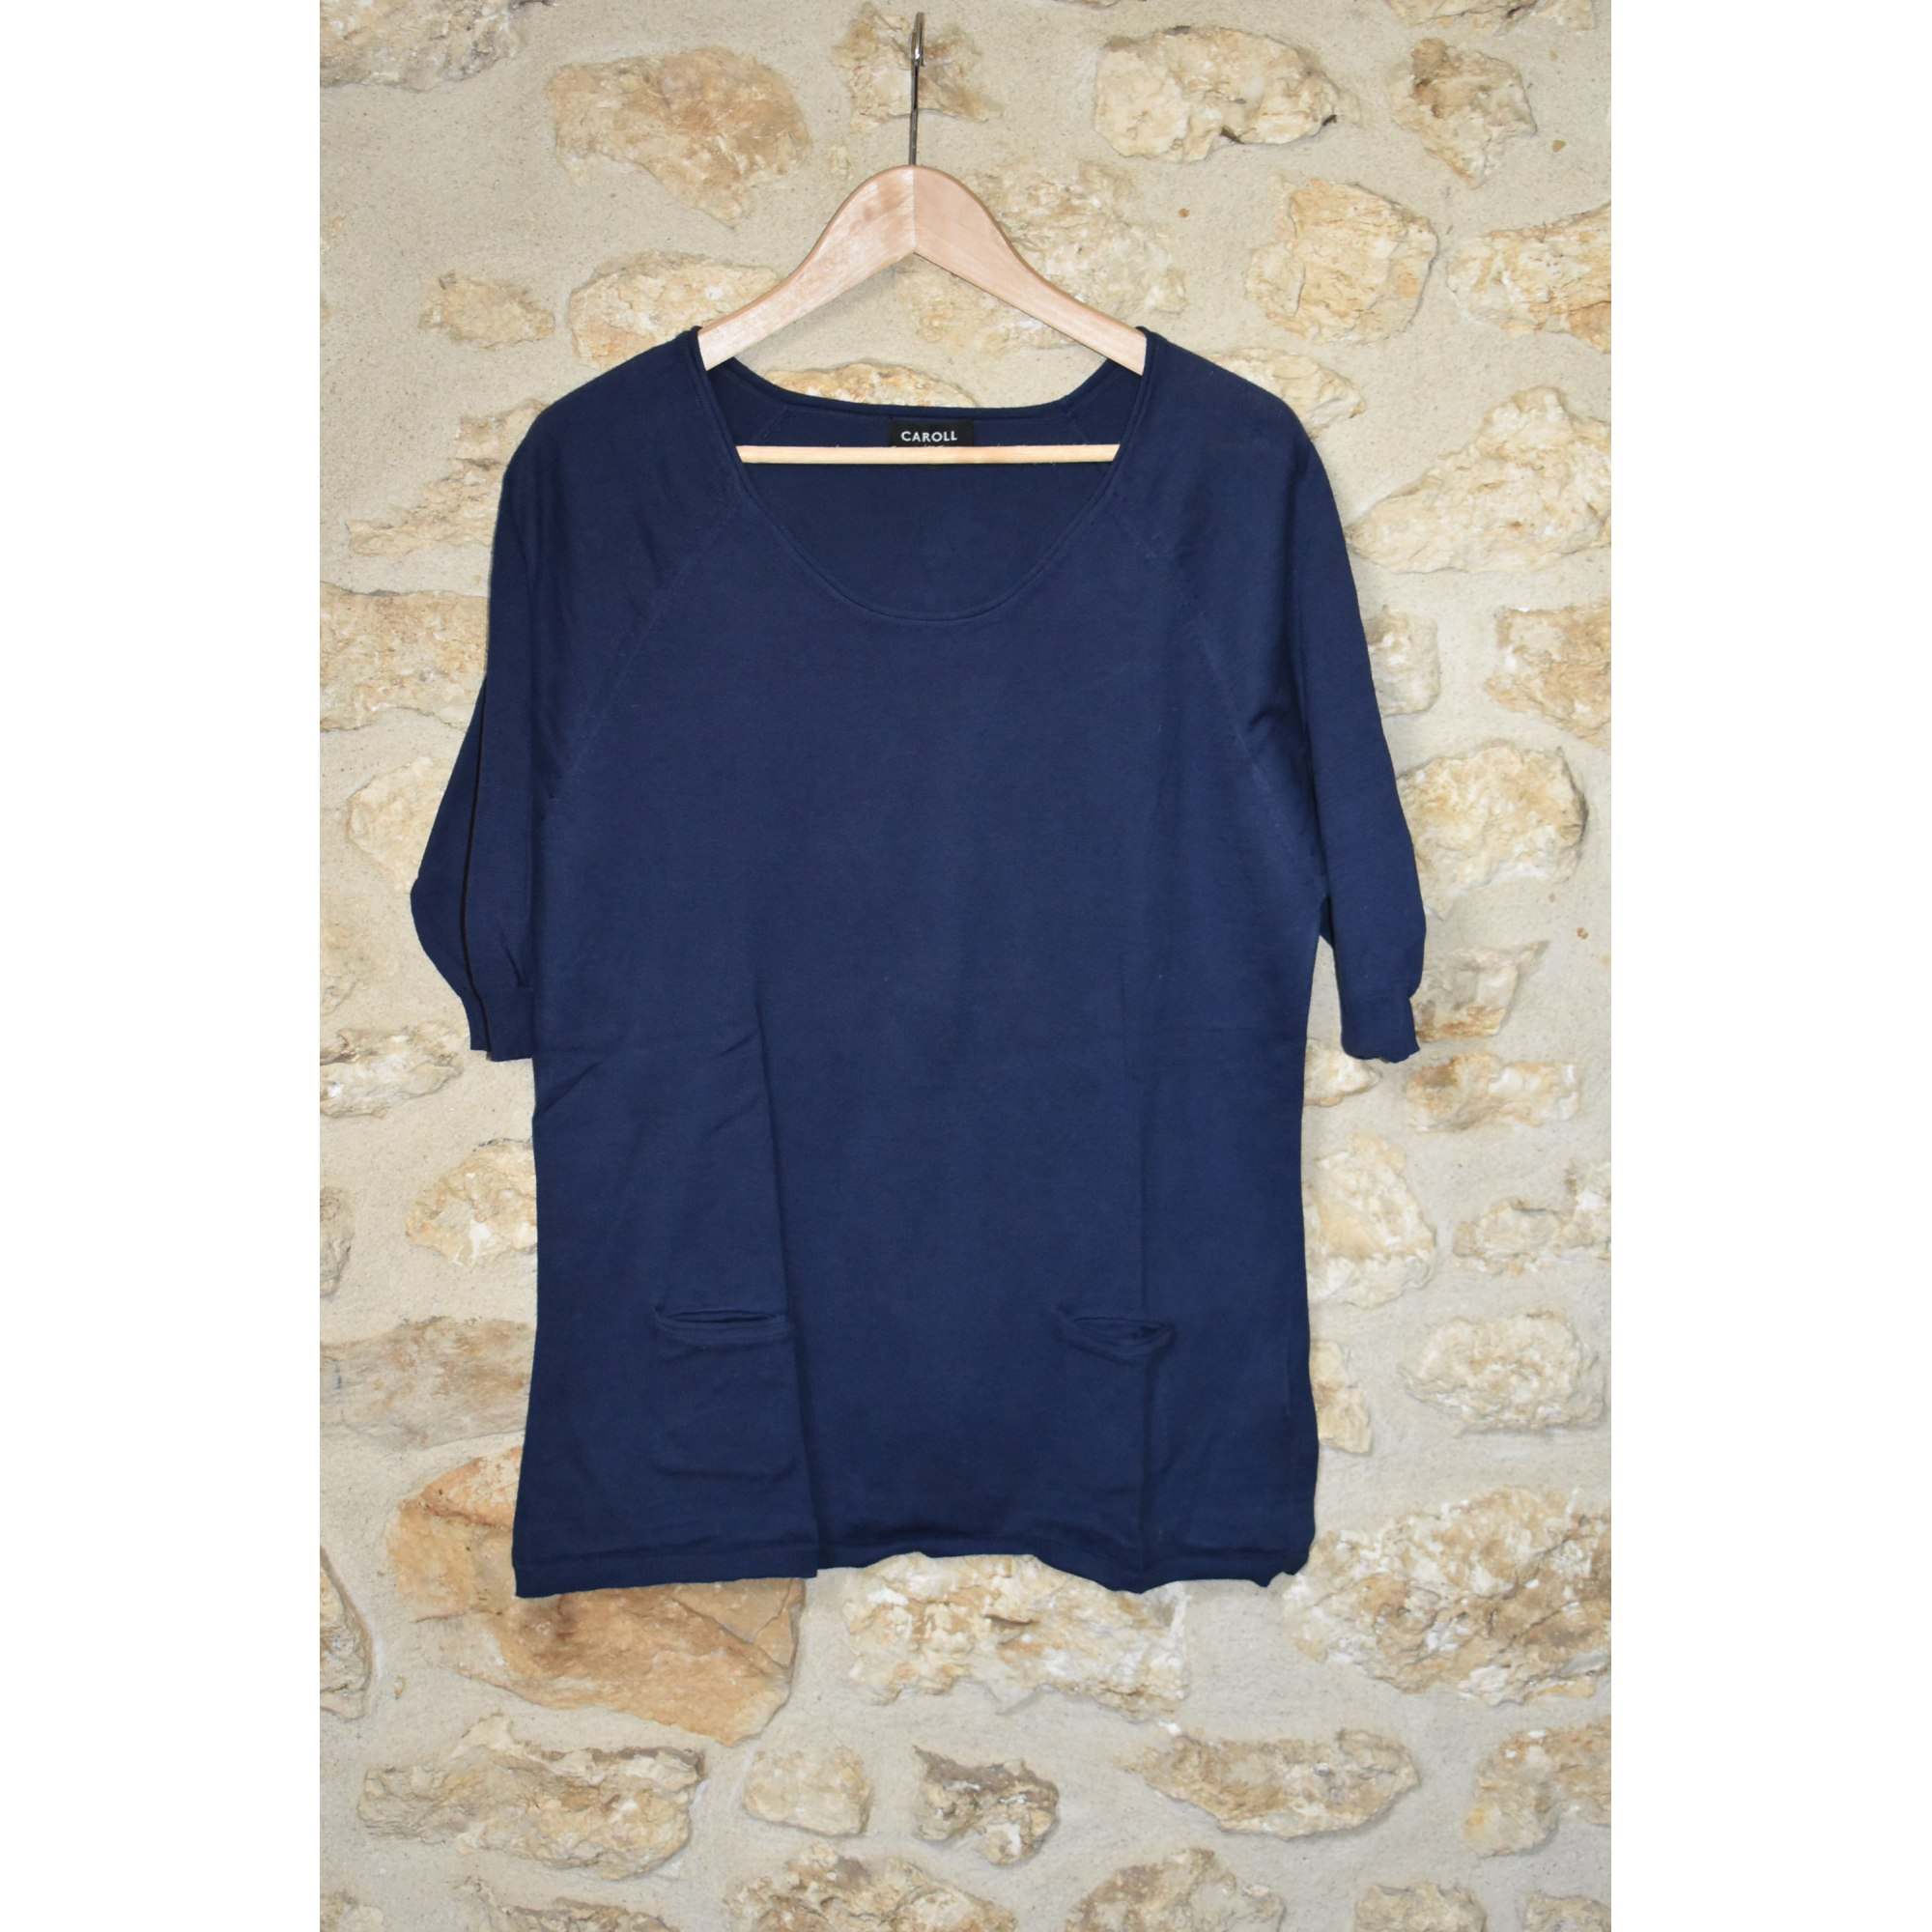 Pull tunique CAROLL Bleu, bleu marine, bleu turquoise